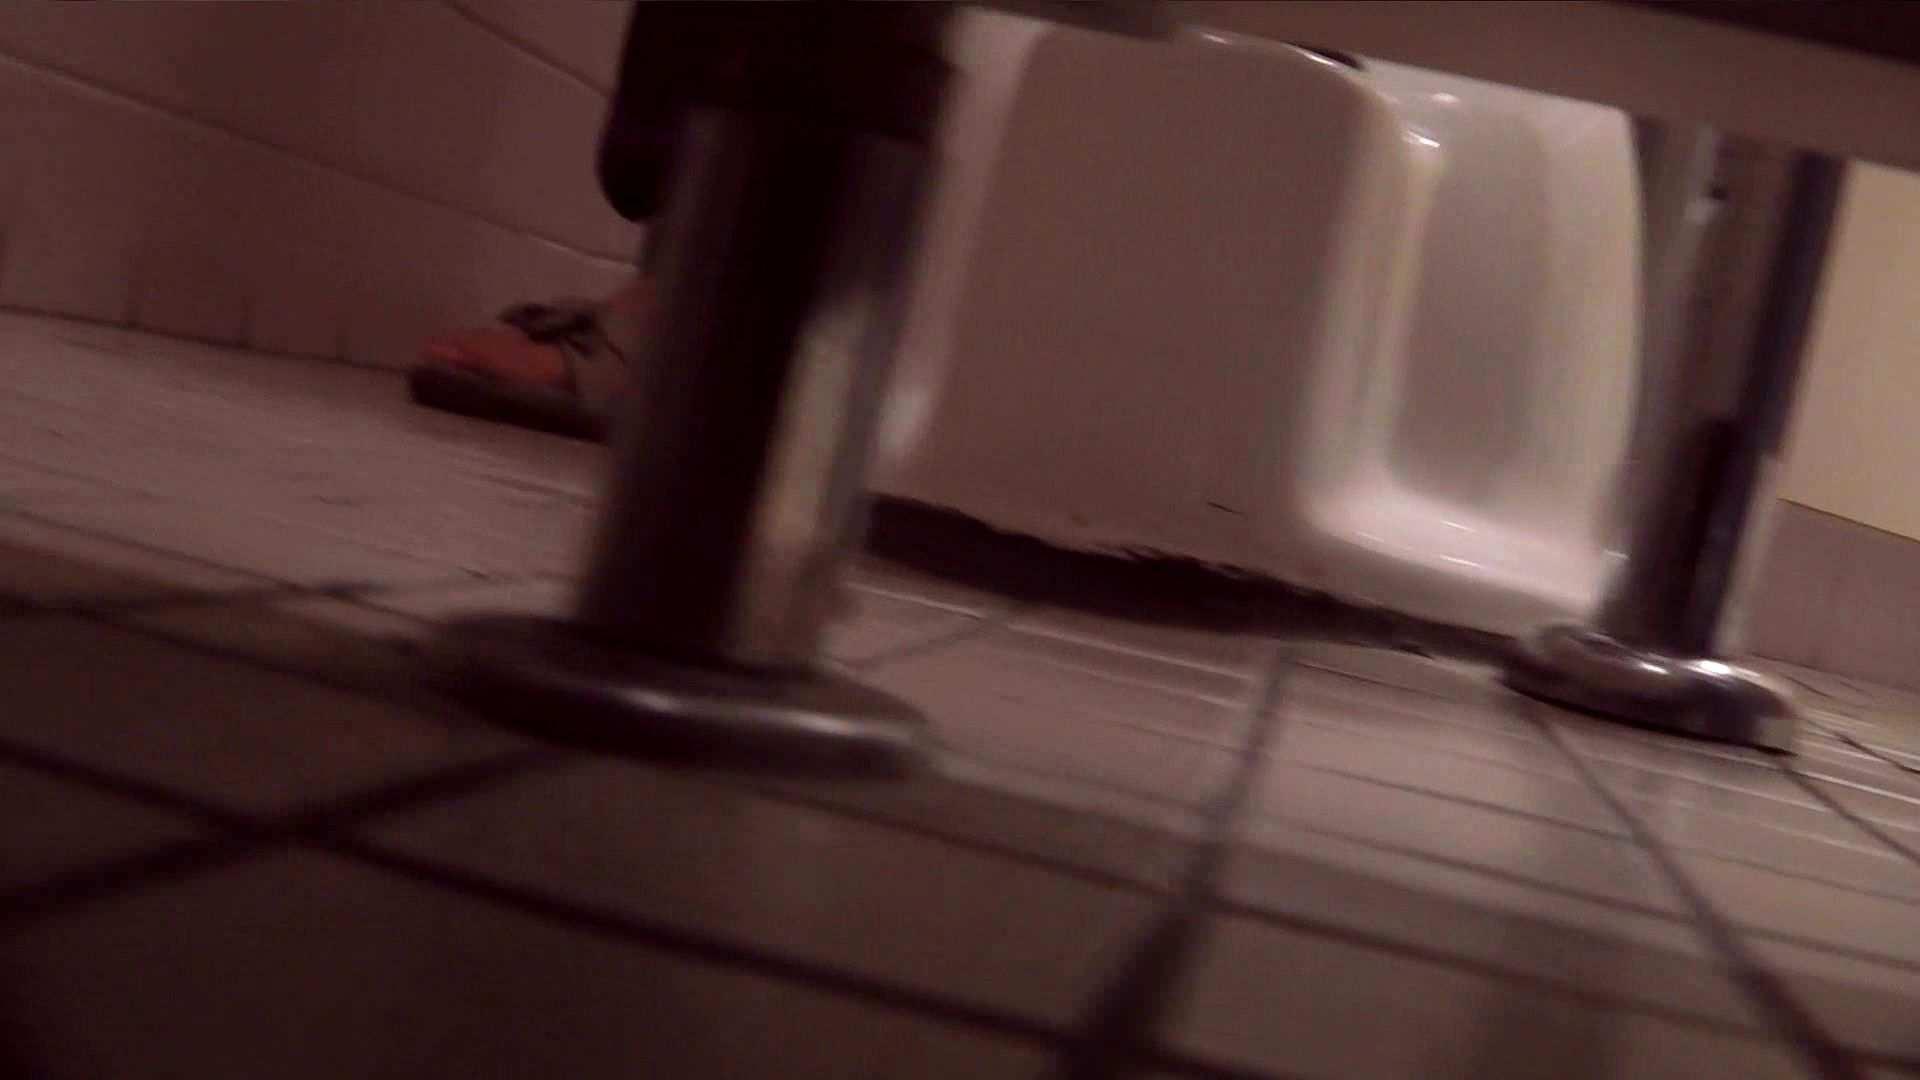 vol.16 命がけ潜伏洗面所! 美女たっぷり!! 美女すけべ画像 すけべAV動画紹介 90連発 63